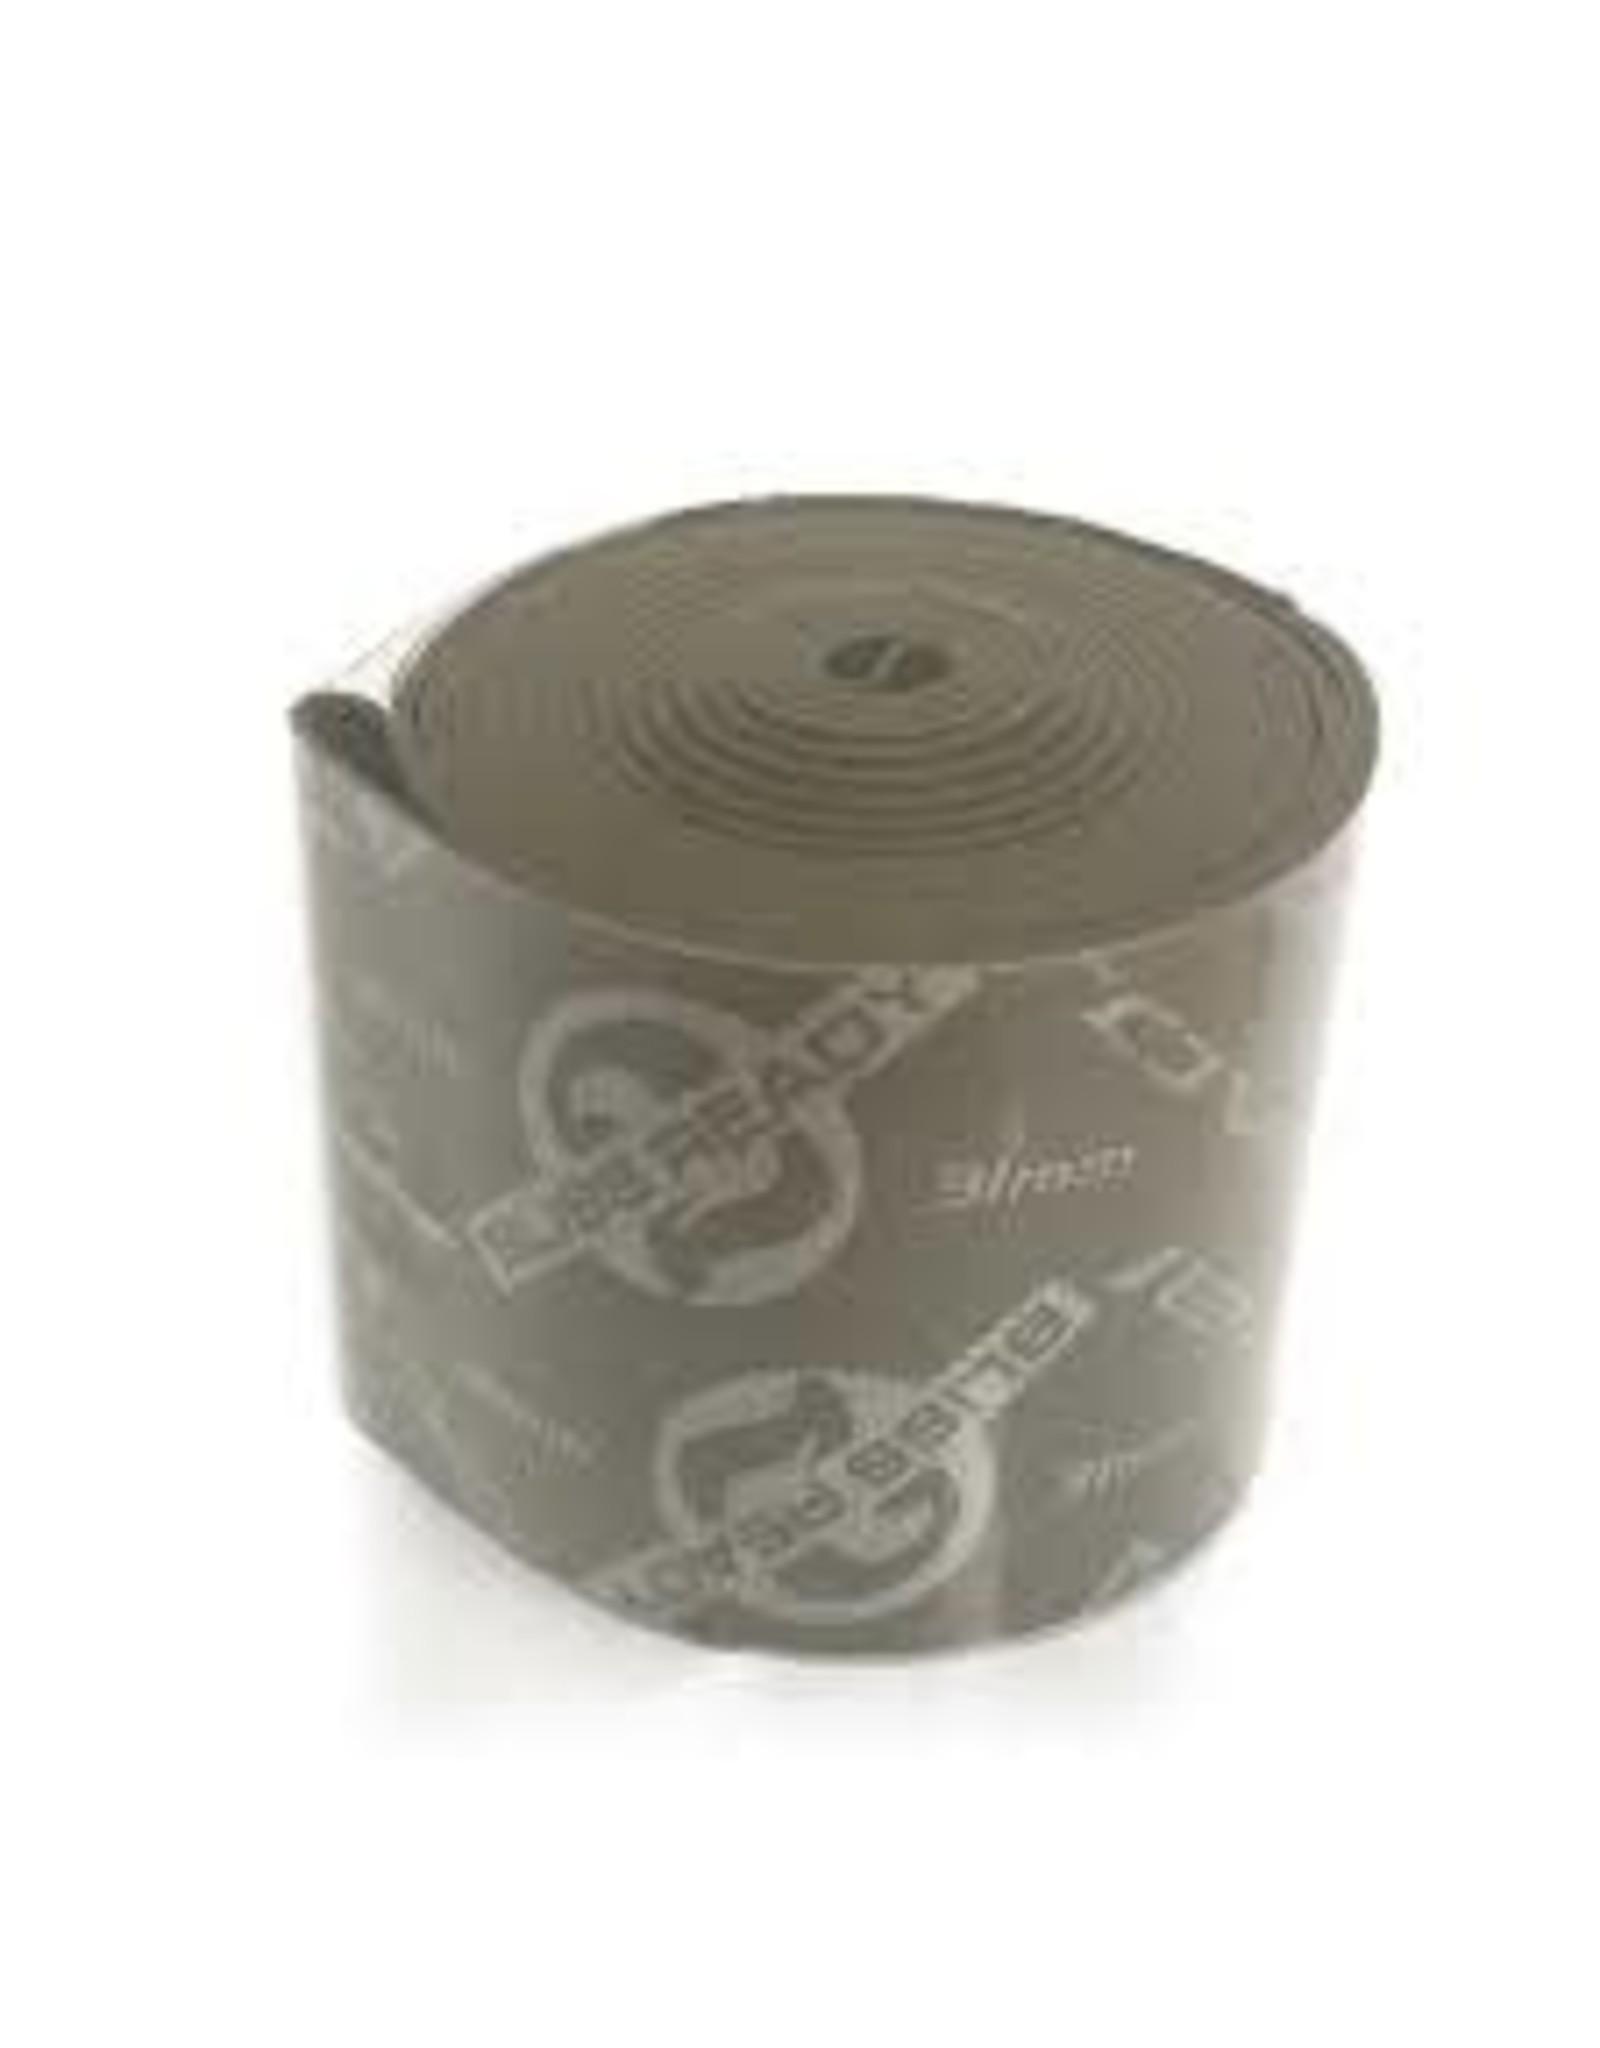 Specialized Rim Strip Roval 2Bliss 29x31mm Box of 16